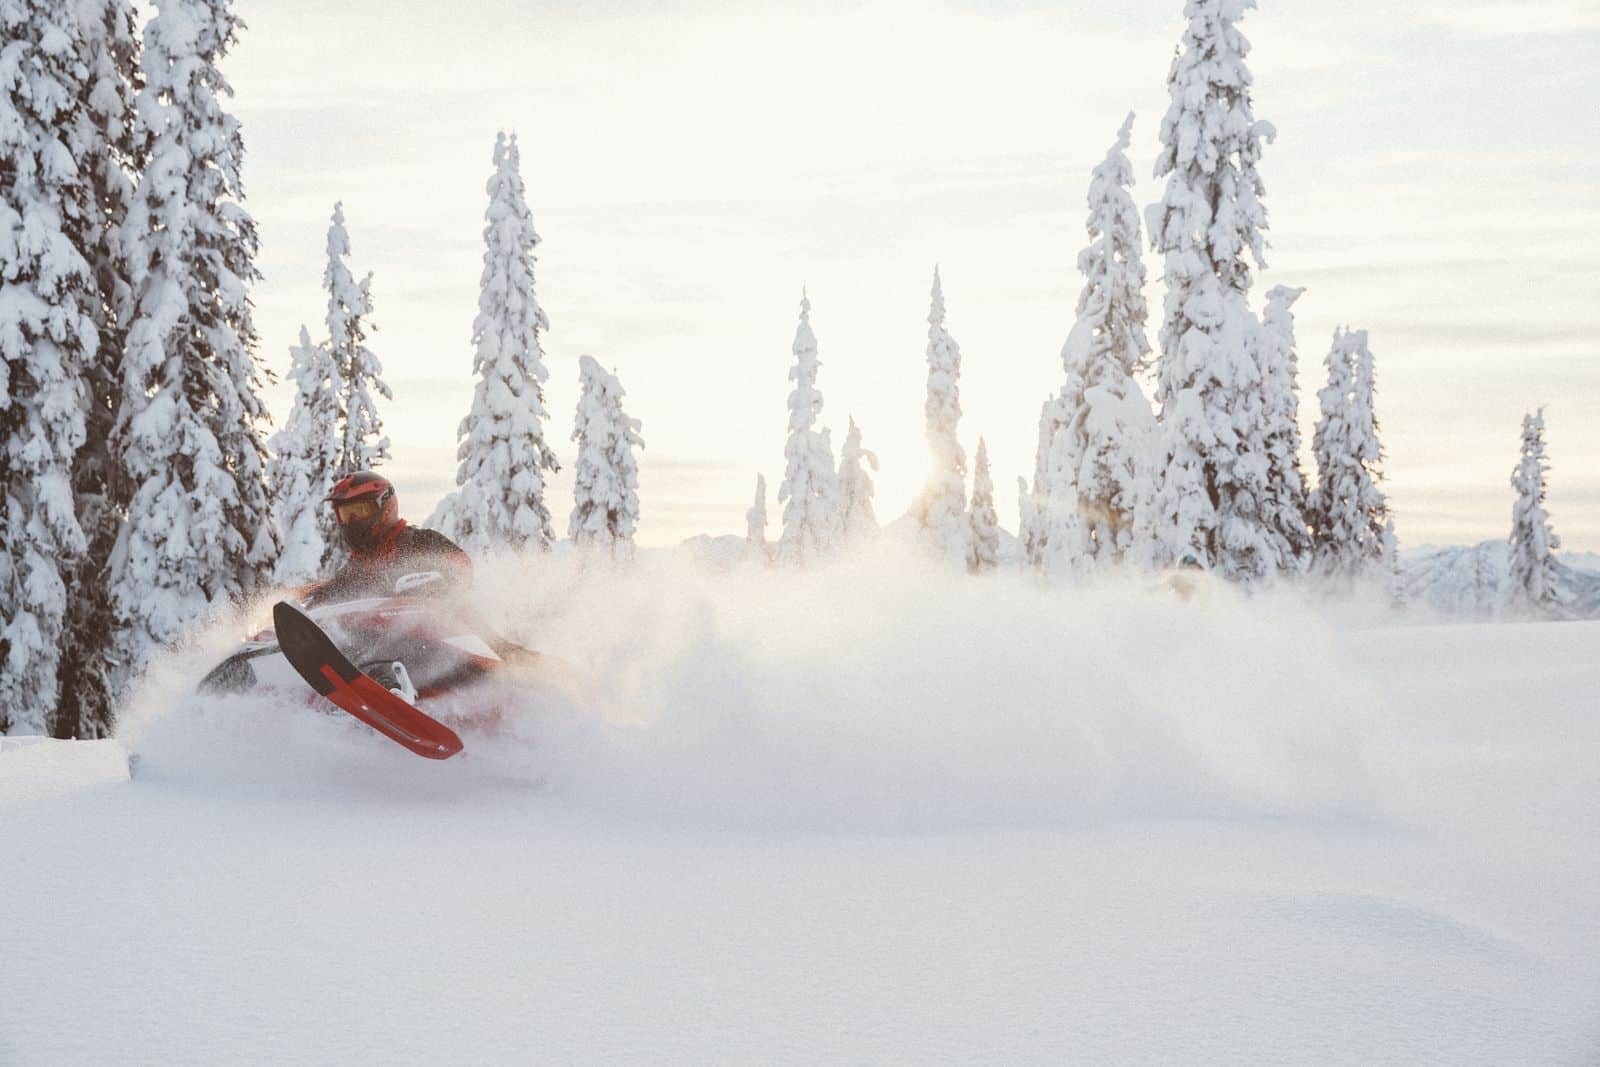 BRP MY2020 Ski-Doo Snowmobile Lineup